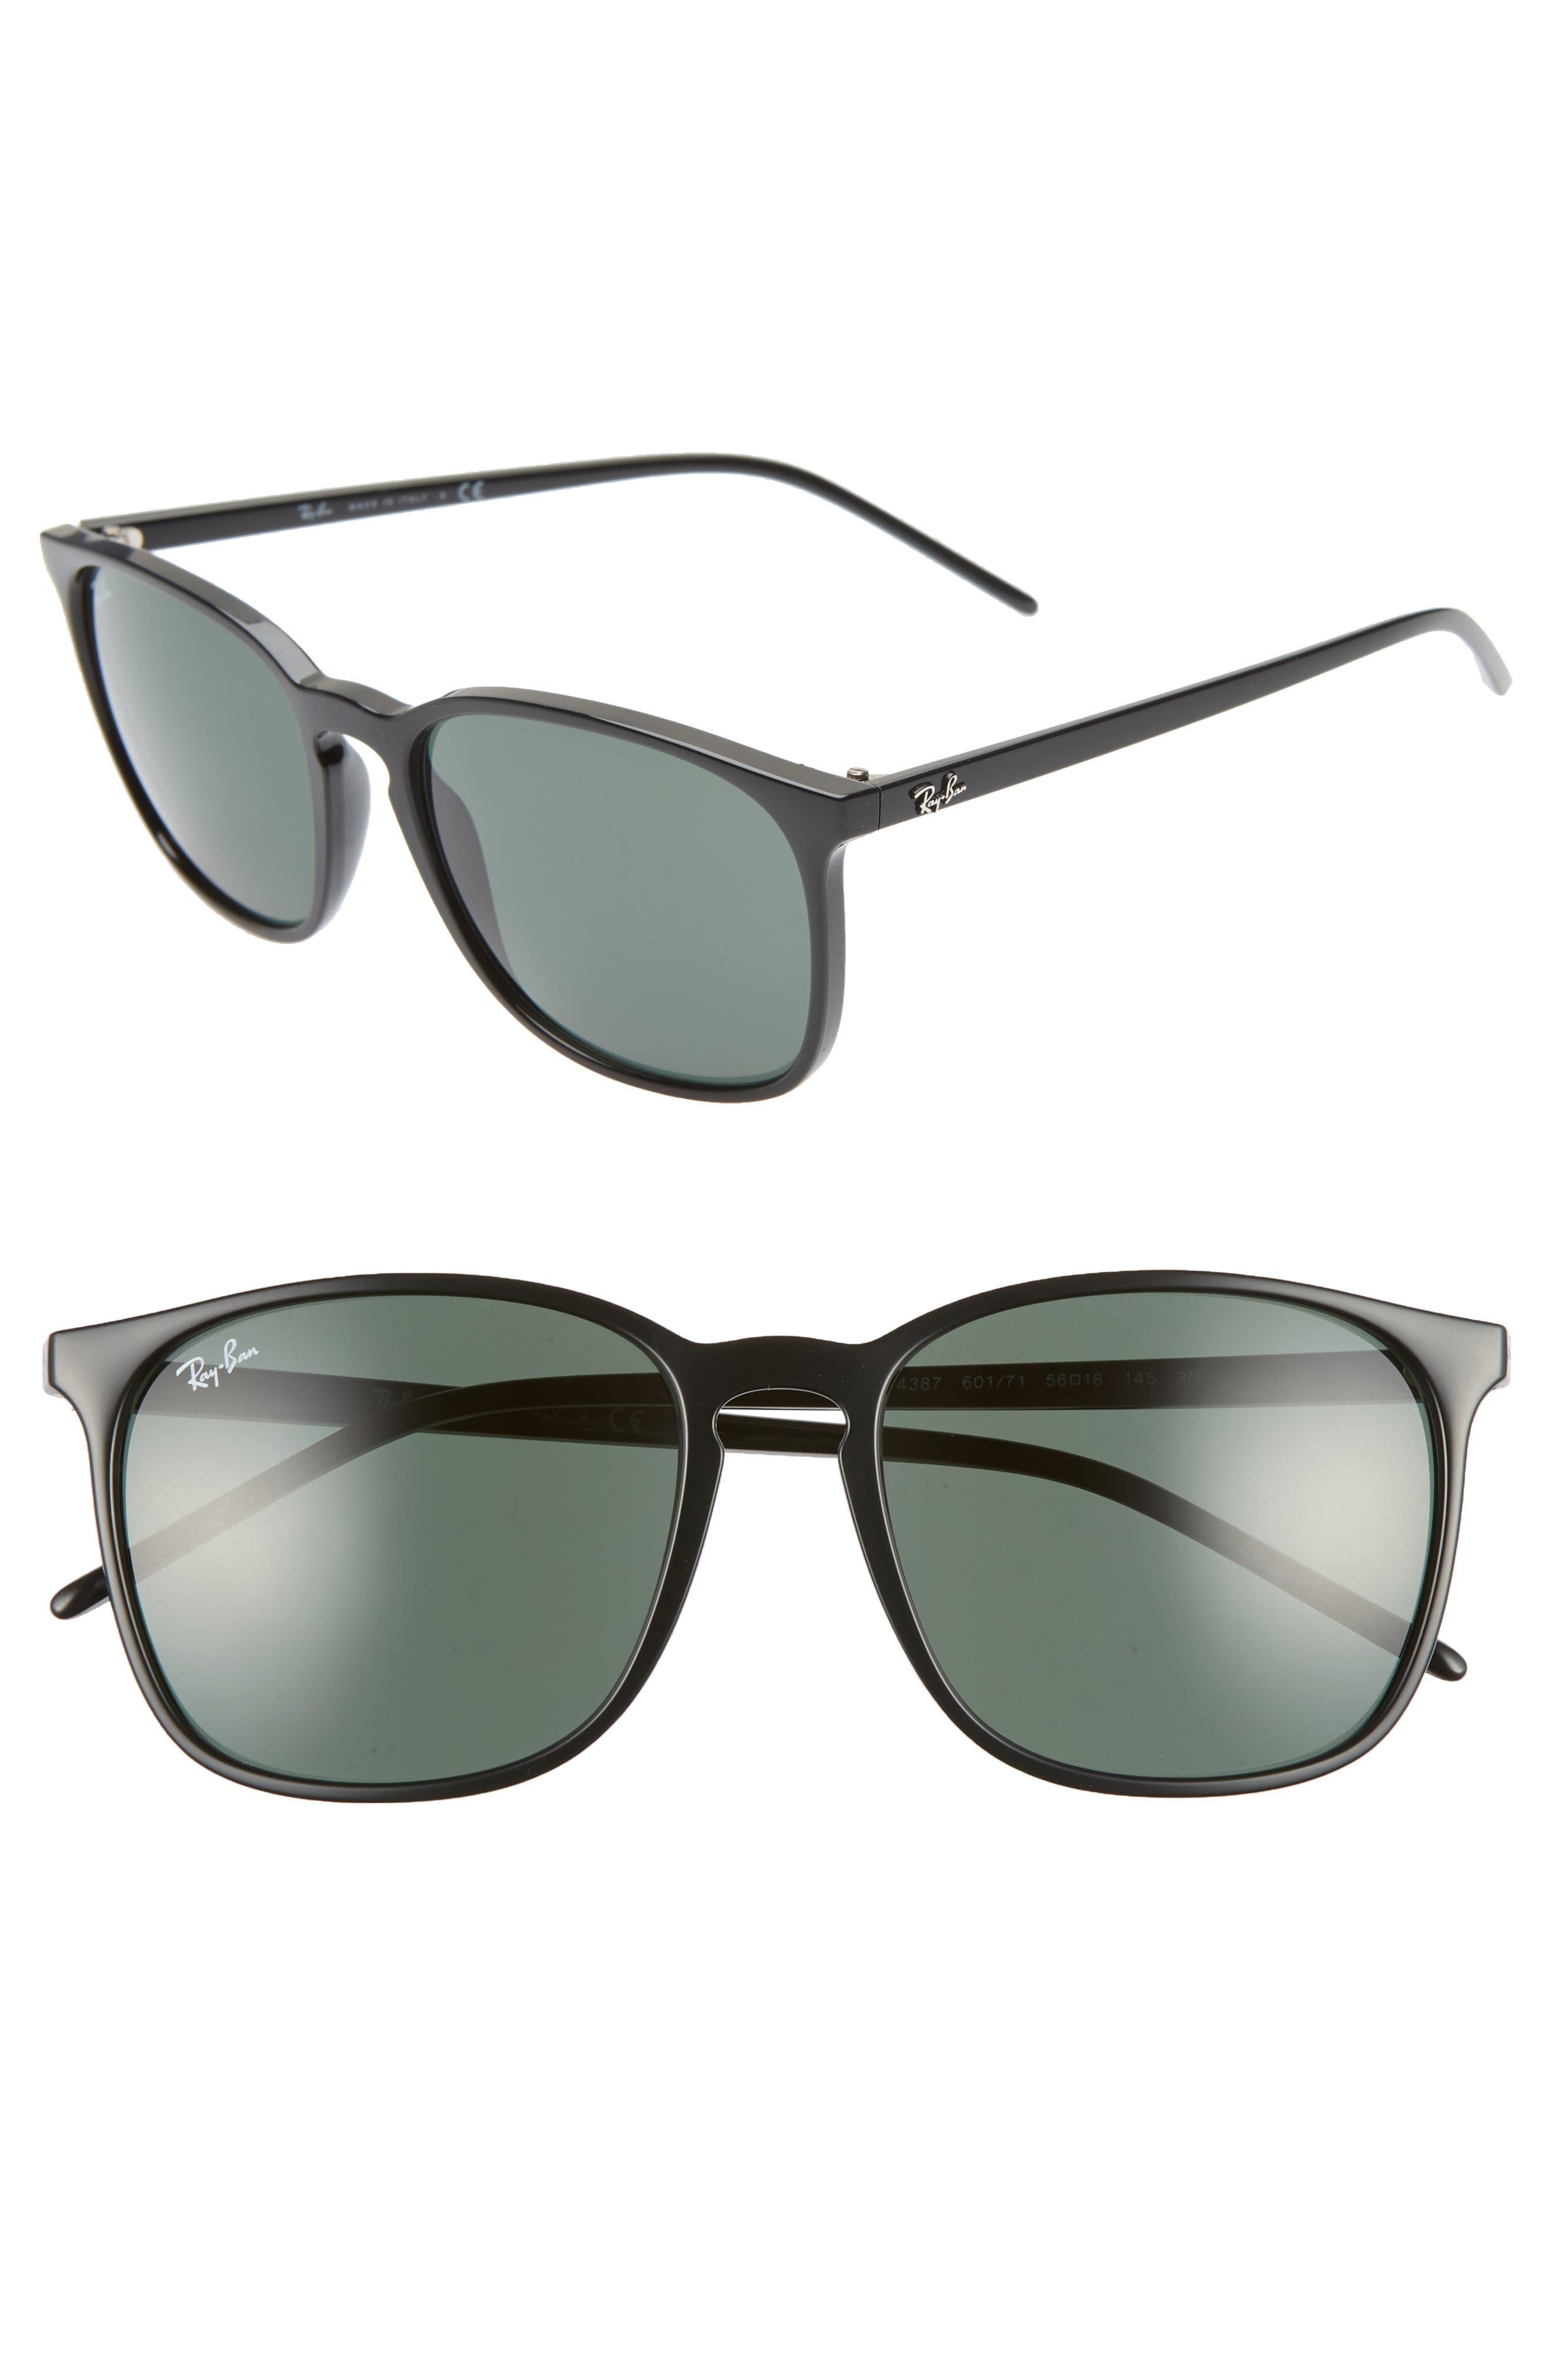 Ray-Ban Phantos 5m Sunglasses - Black